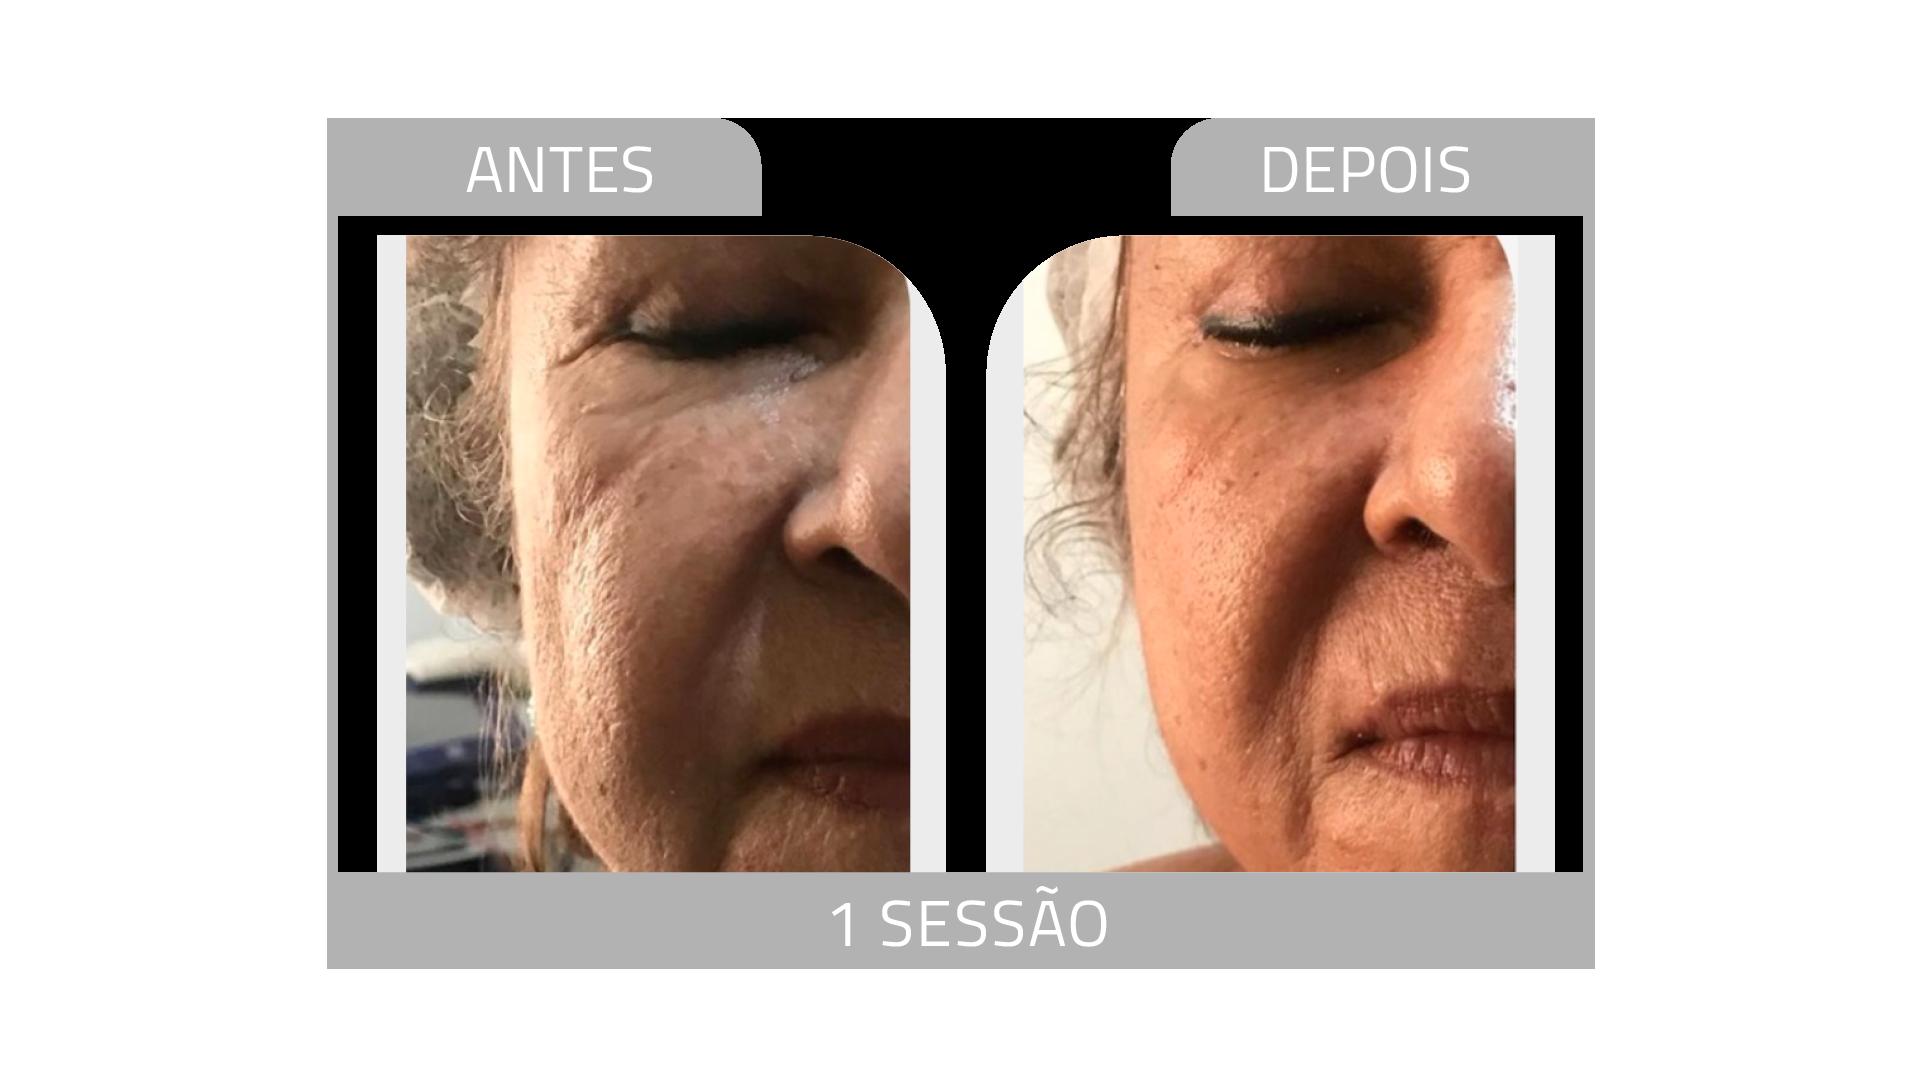 ANTES E DEPOIS FIRMEZ 8.png